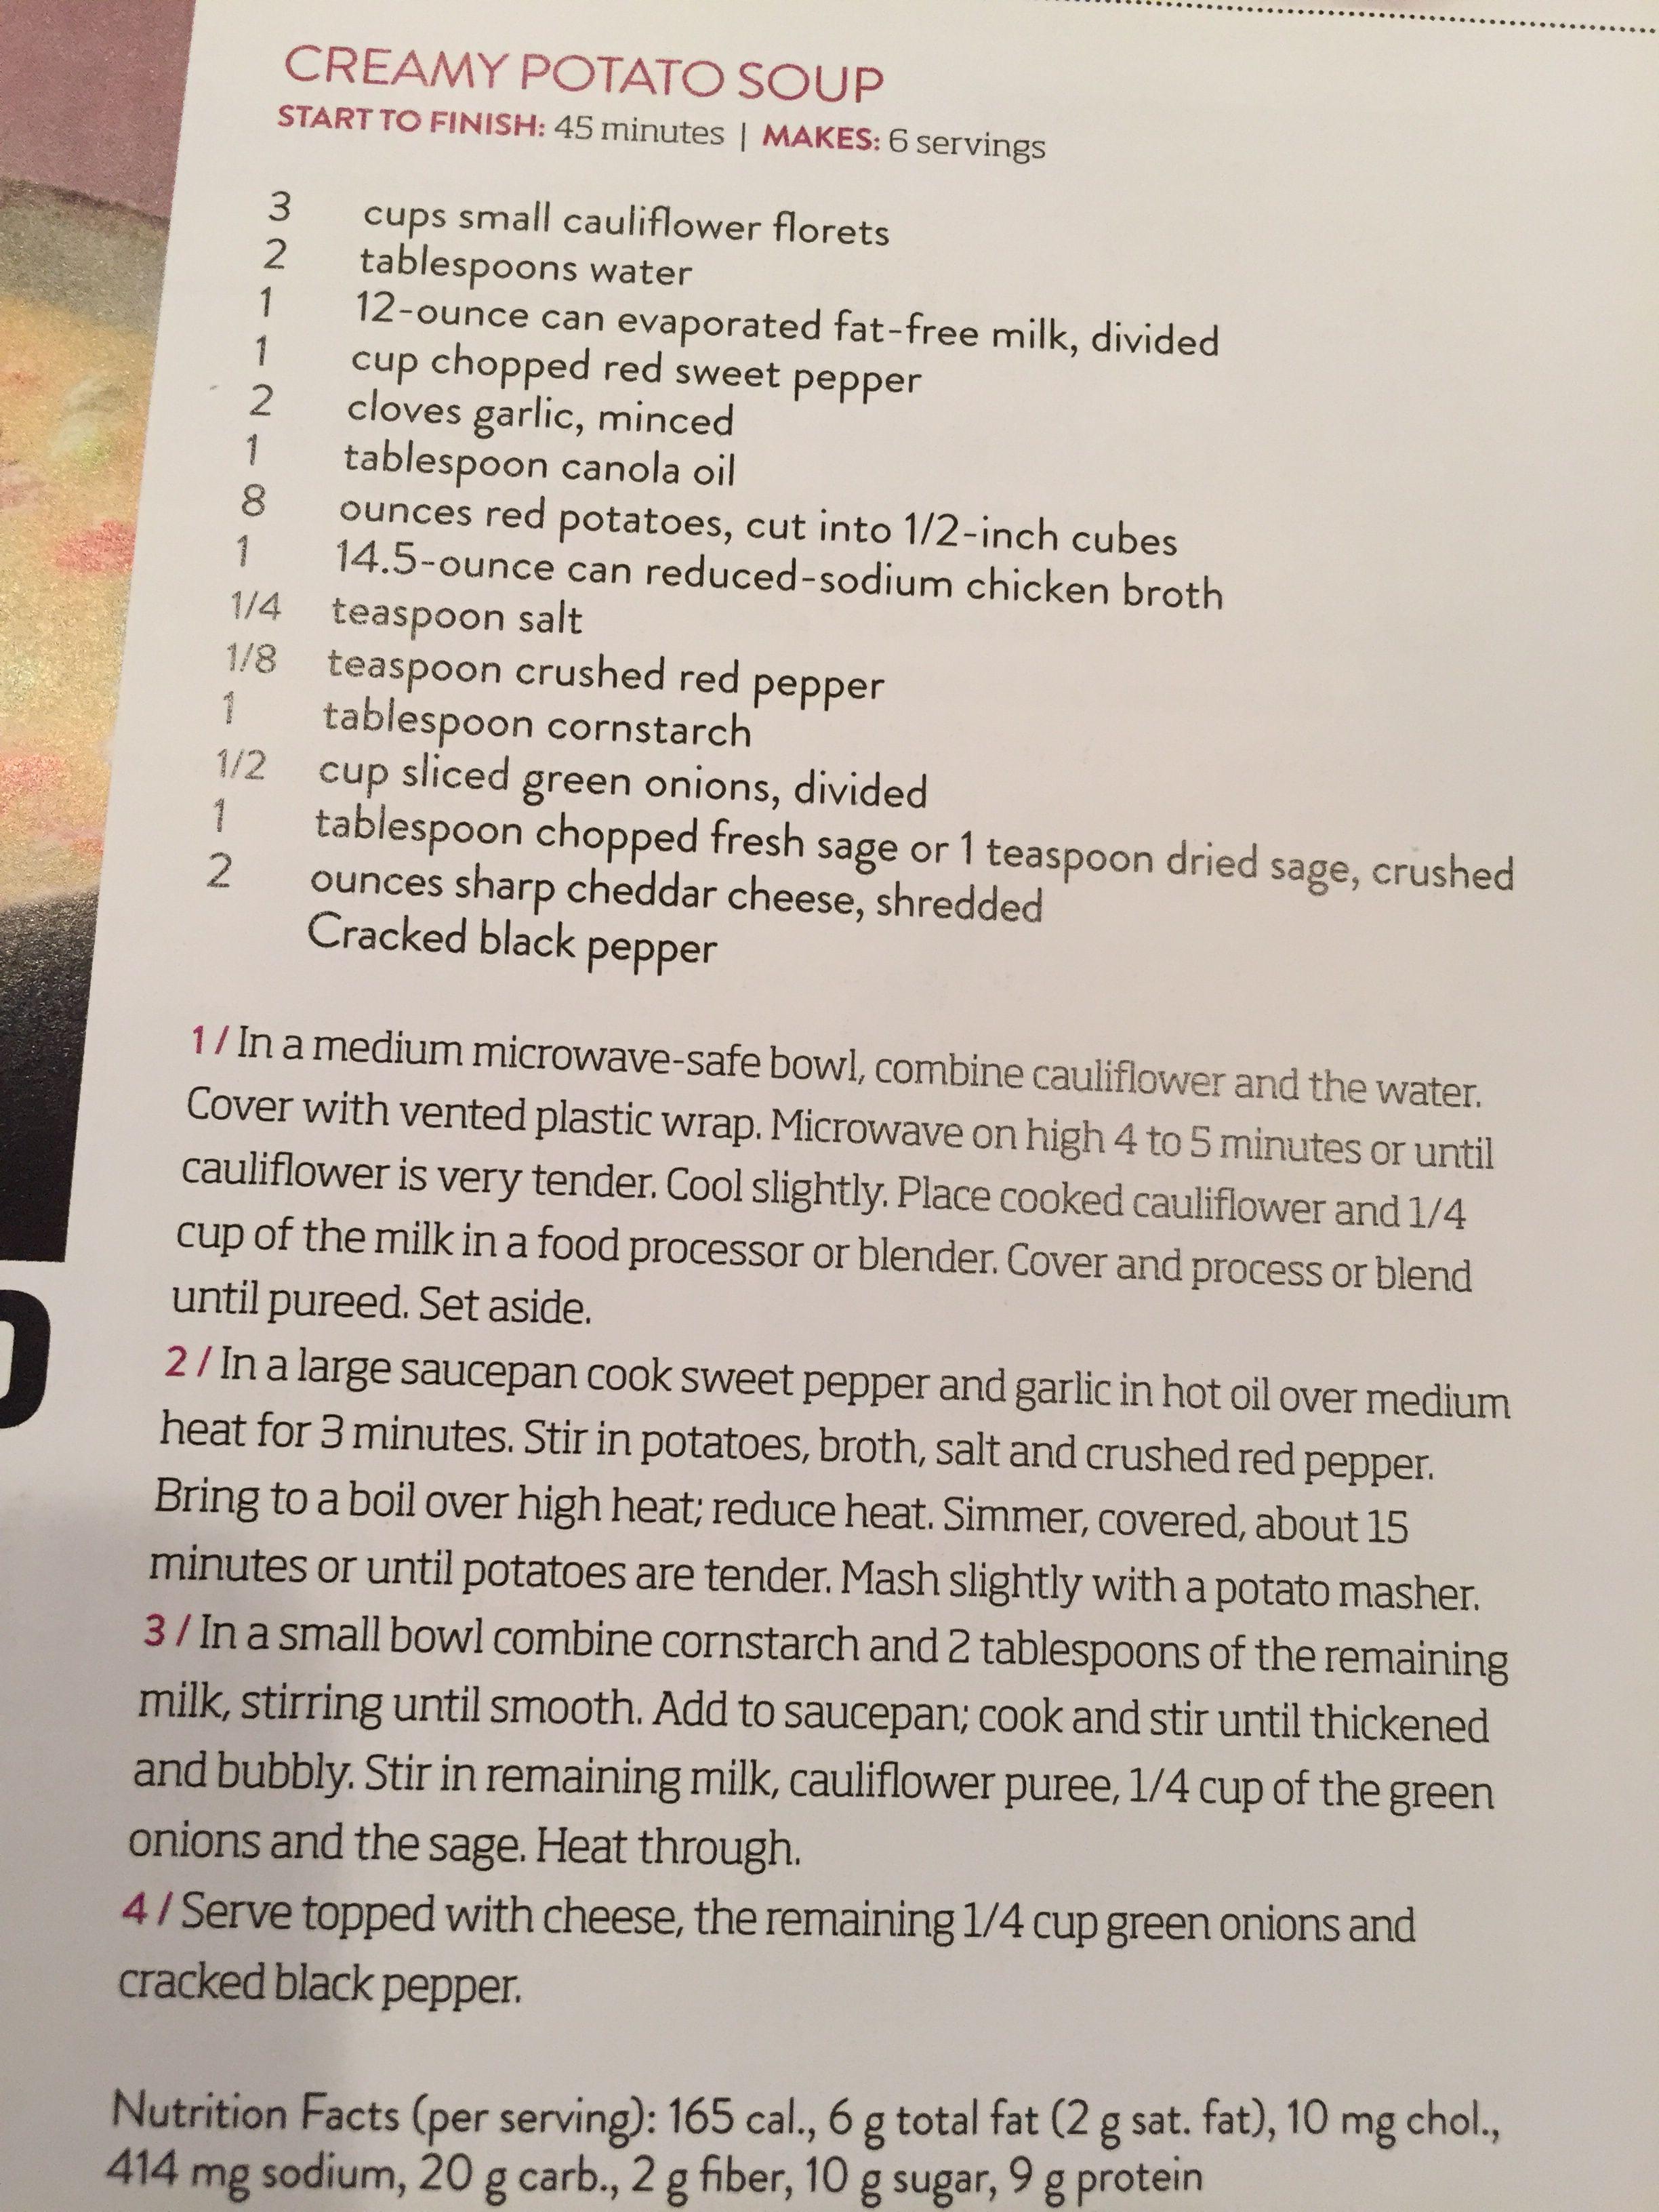 publix potato soup made creamy with cauliflower soups stocks